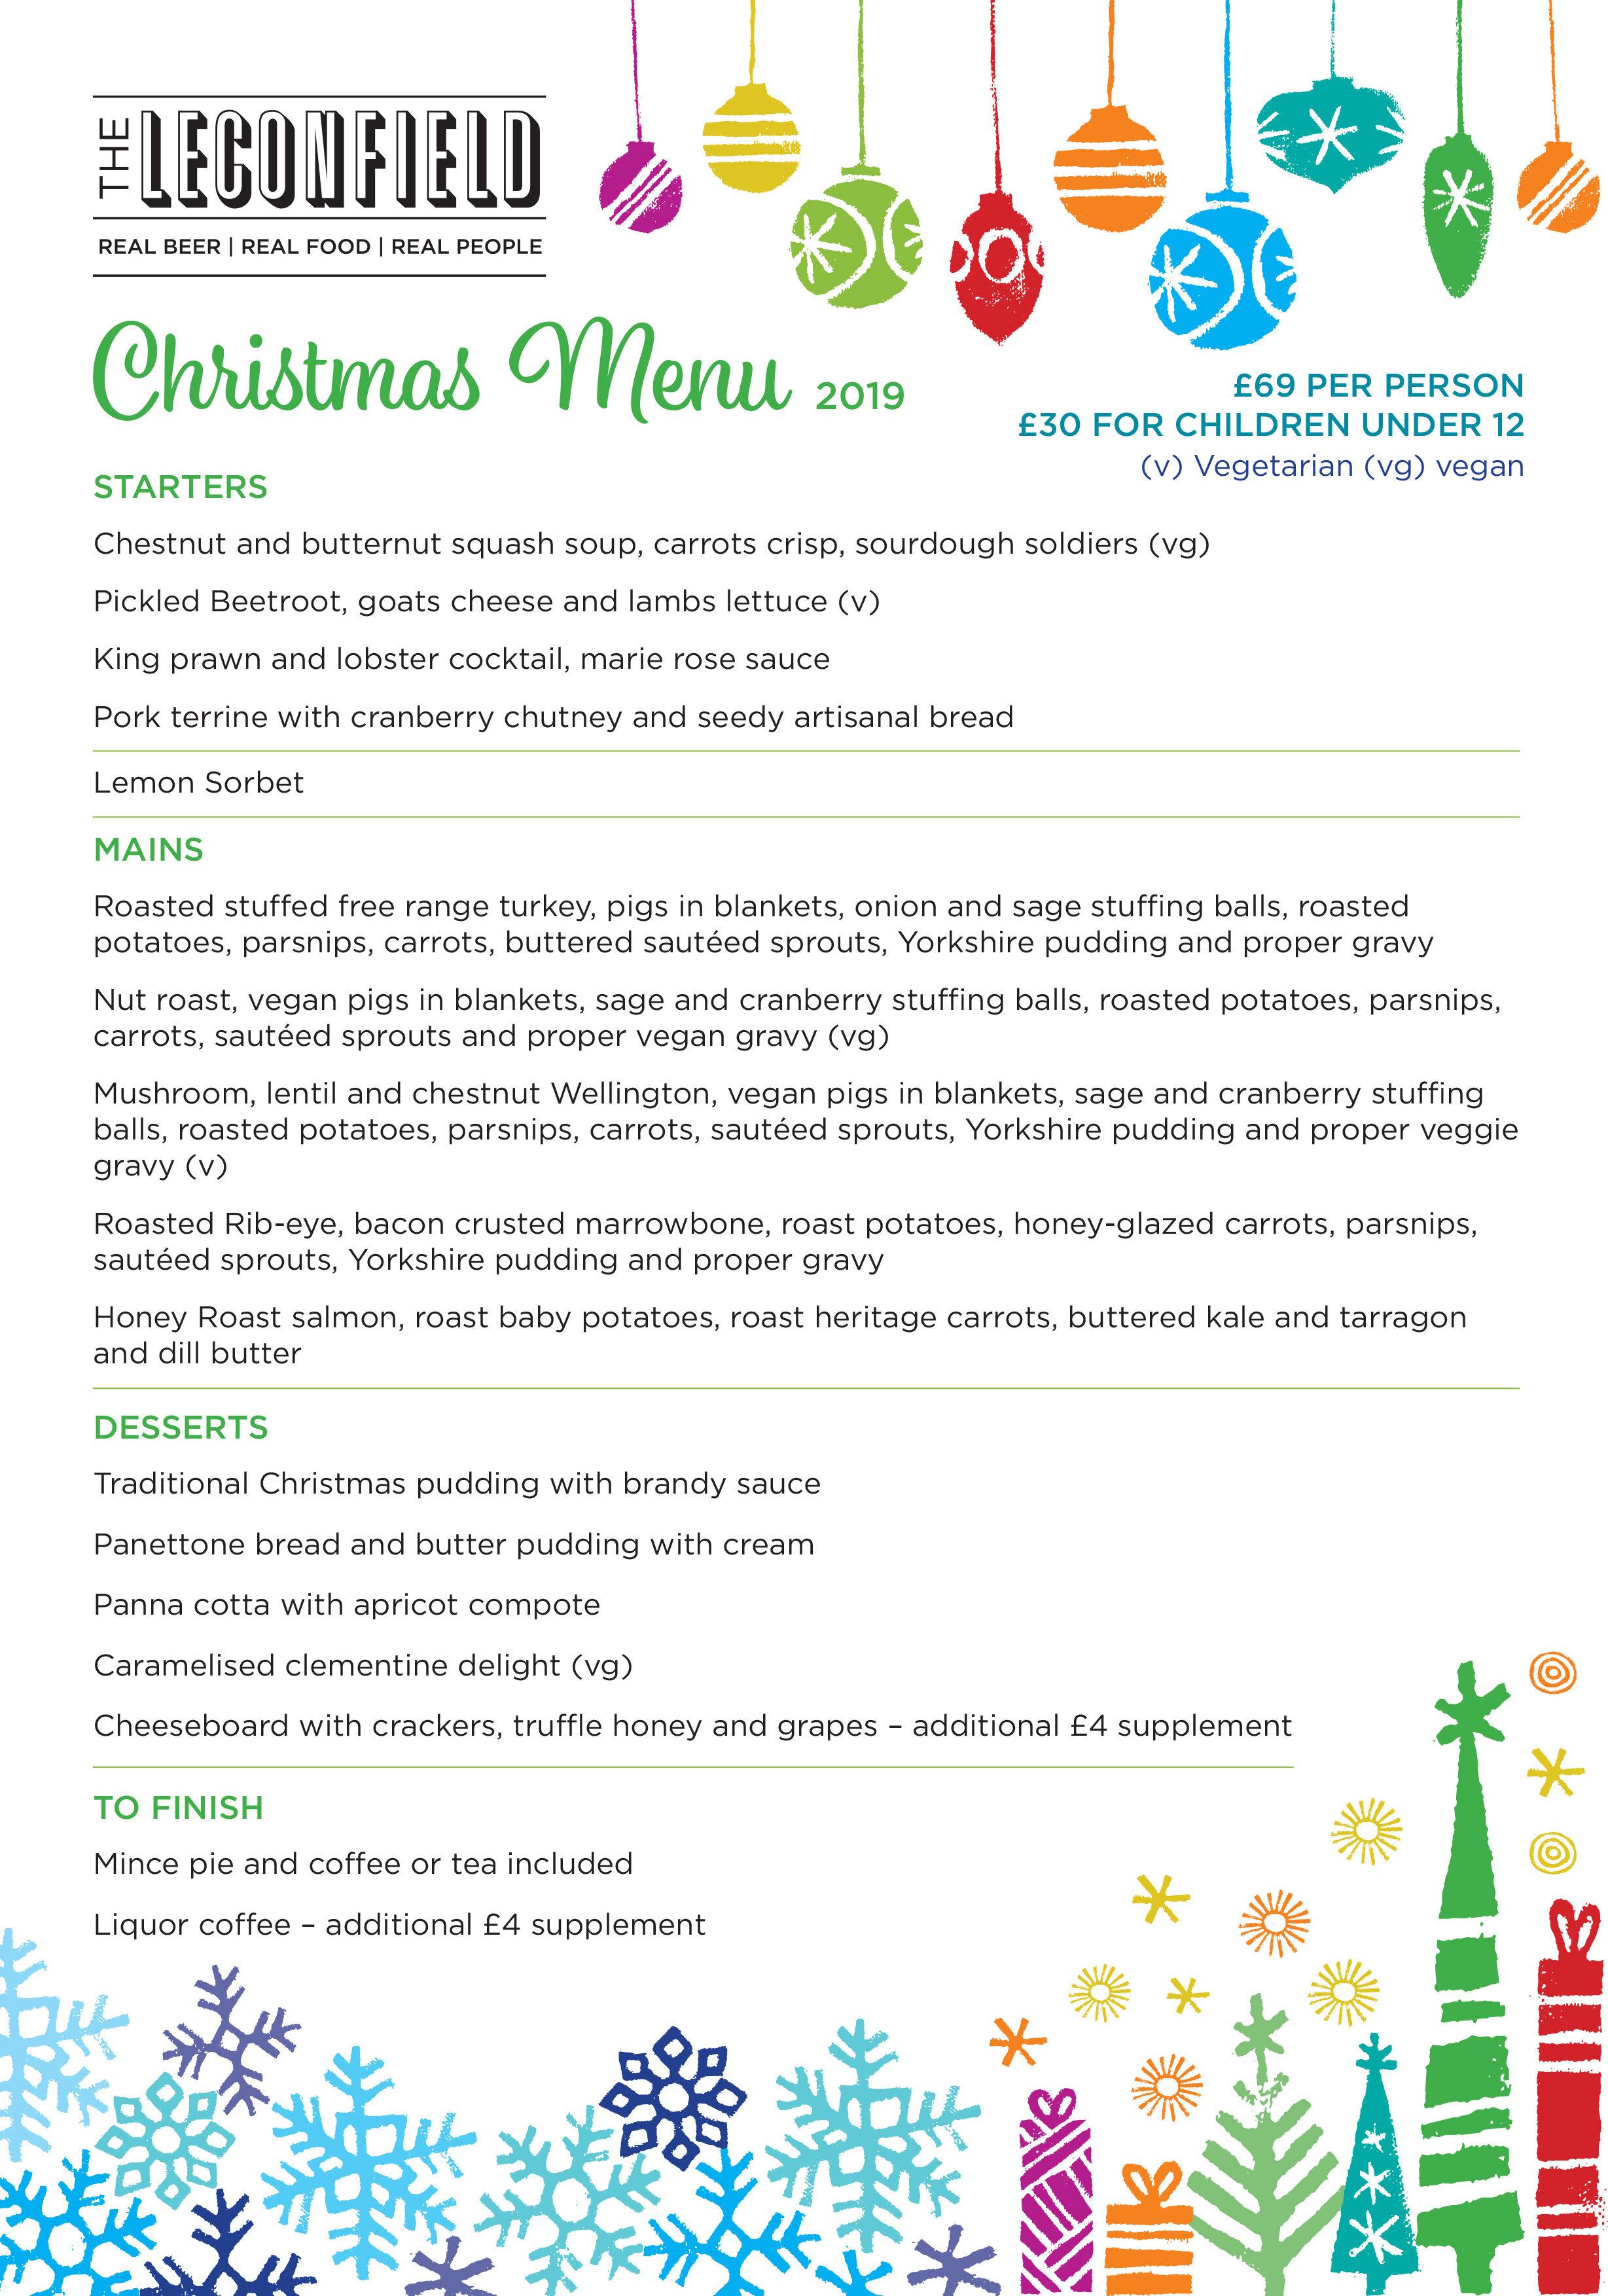 Leconfield-Christmas-menu-2019.jpg